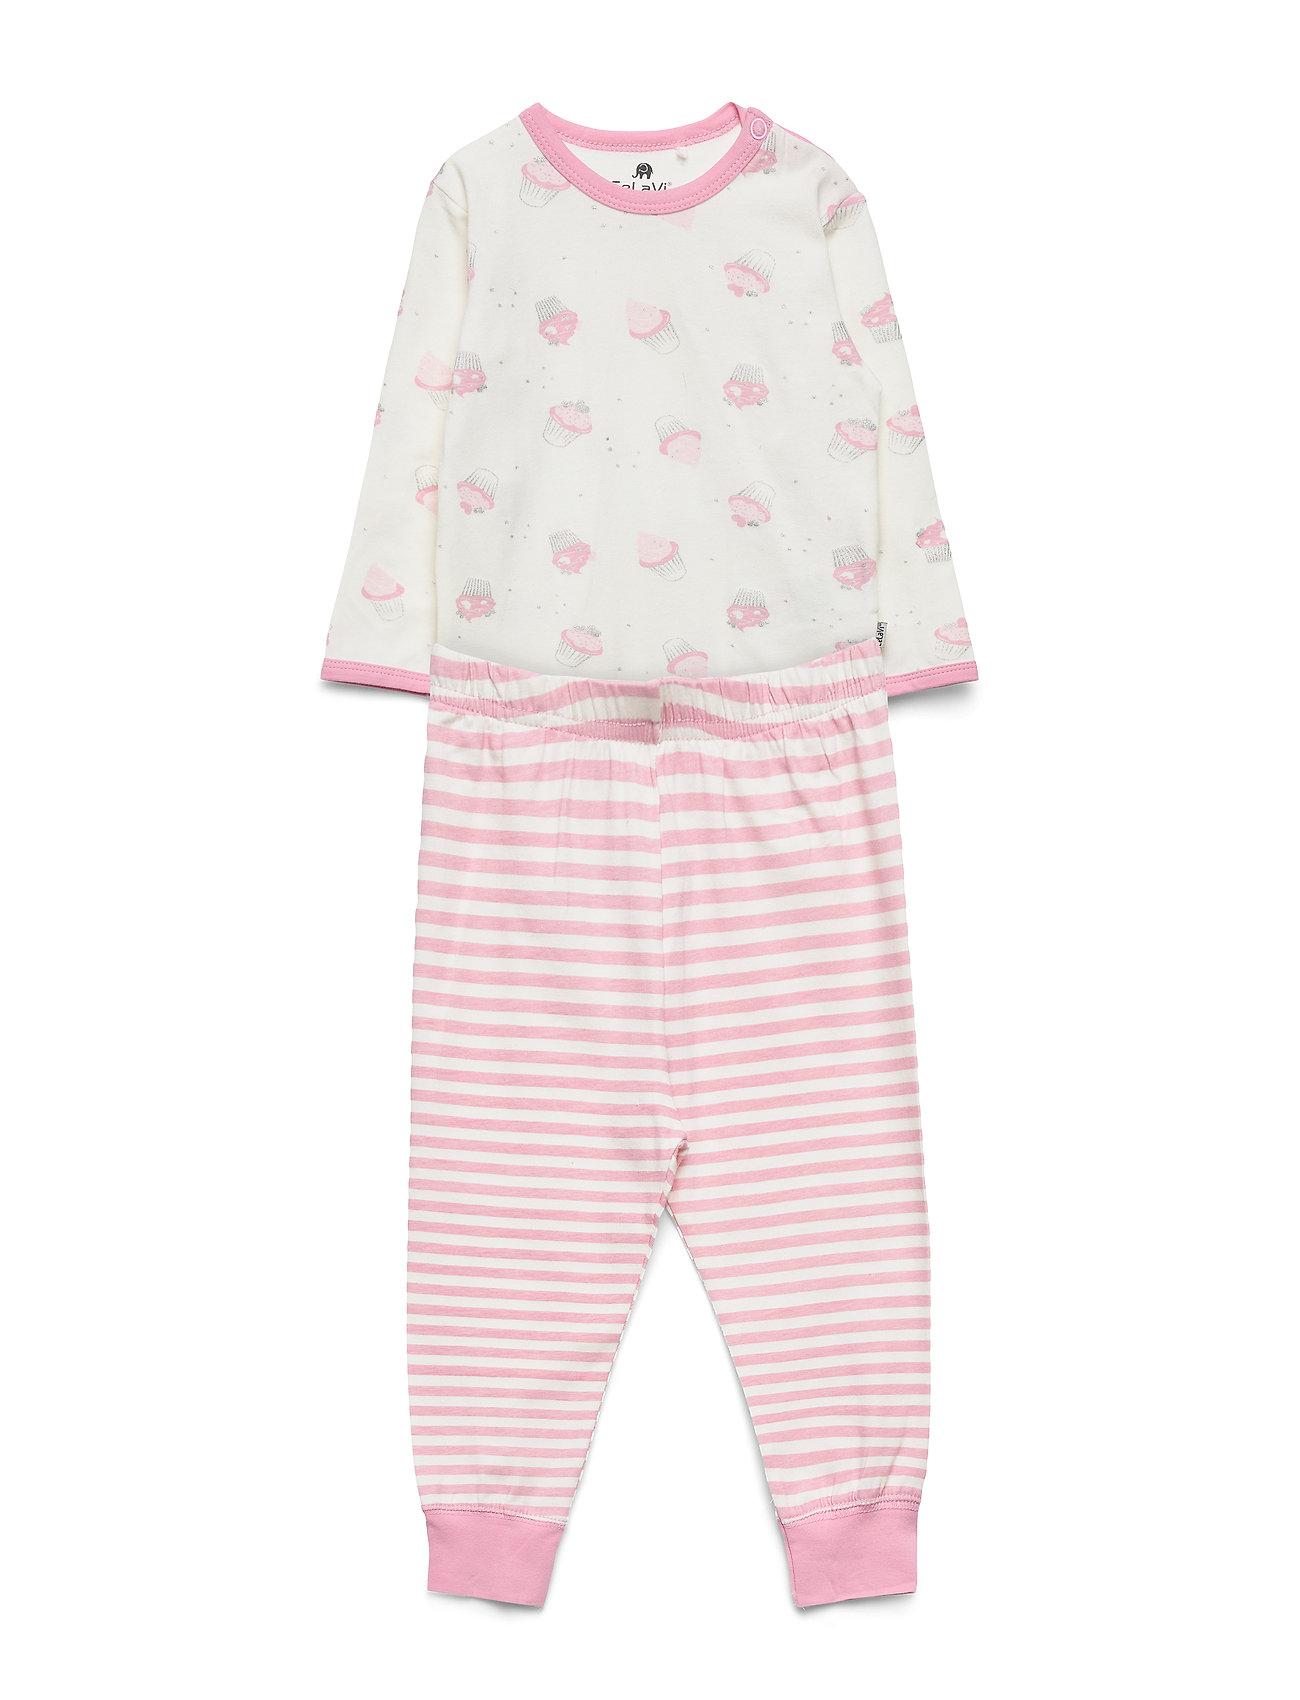 Image of Baby Pyjamas Set -Aop Pyjamassæt Lyserød CeLaVi (3028876757)